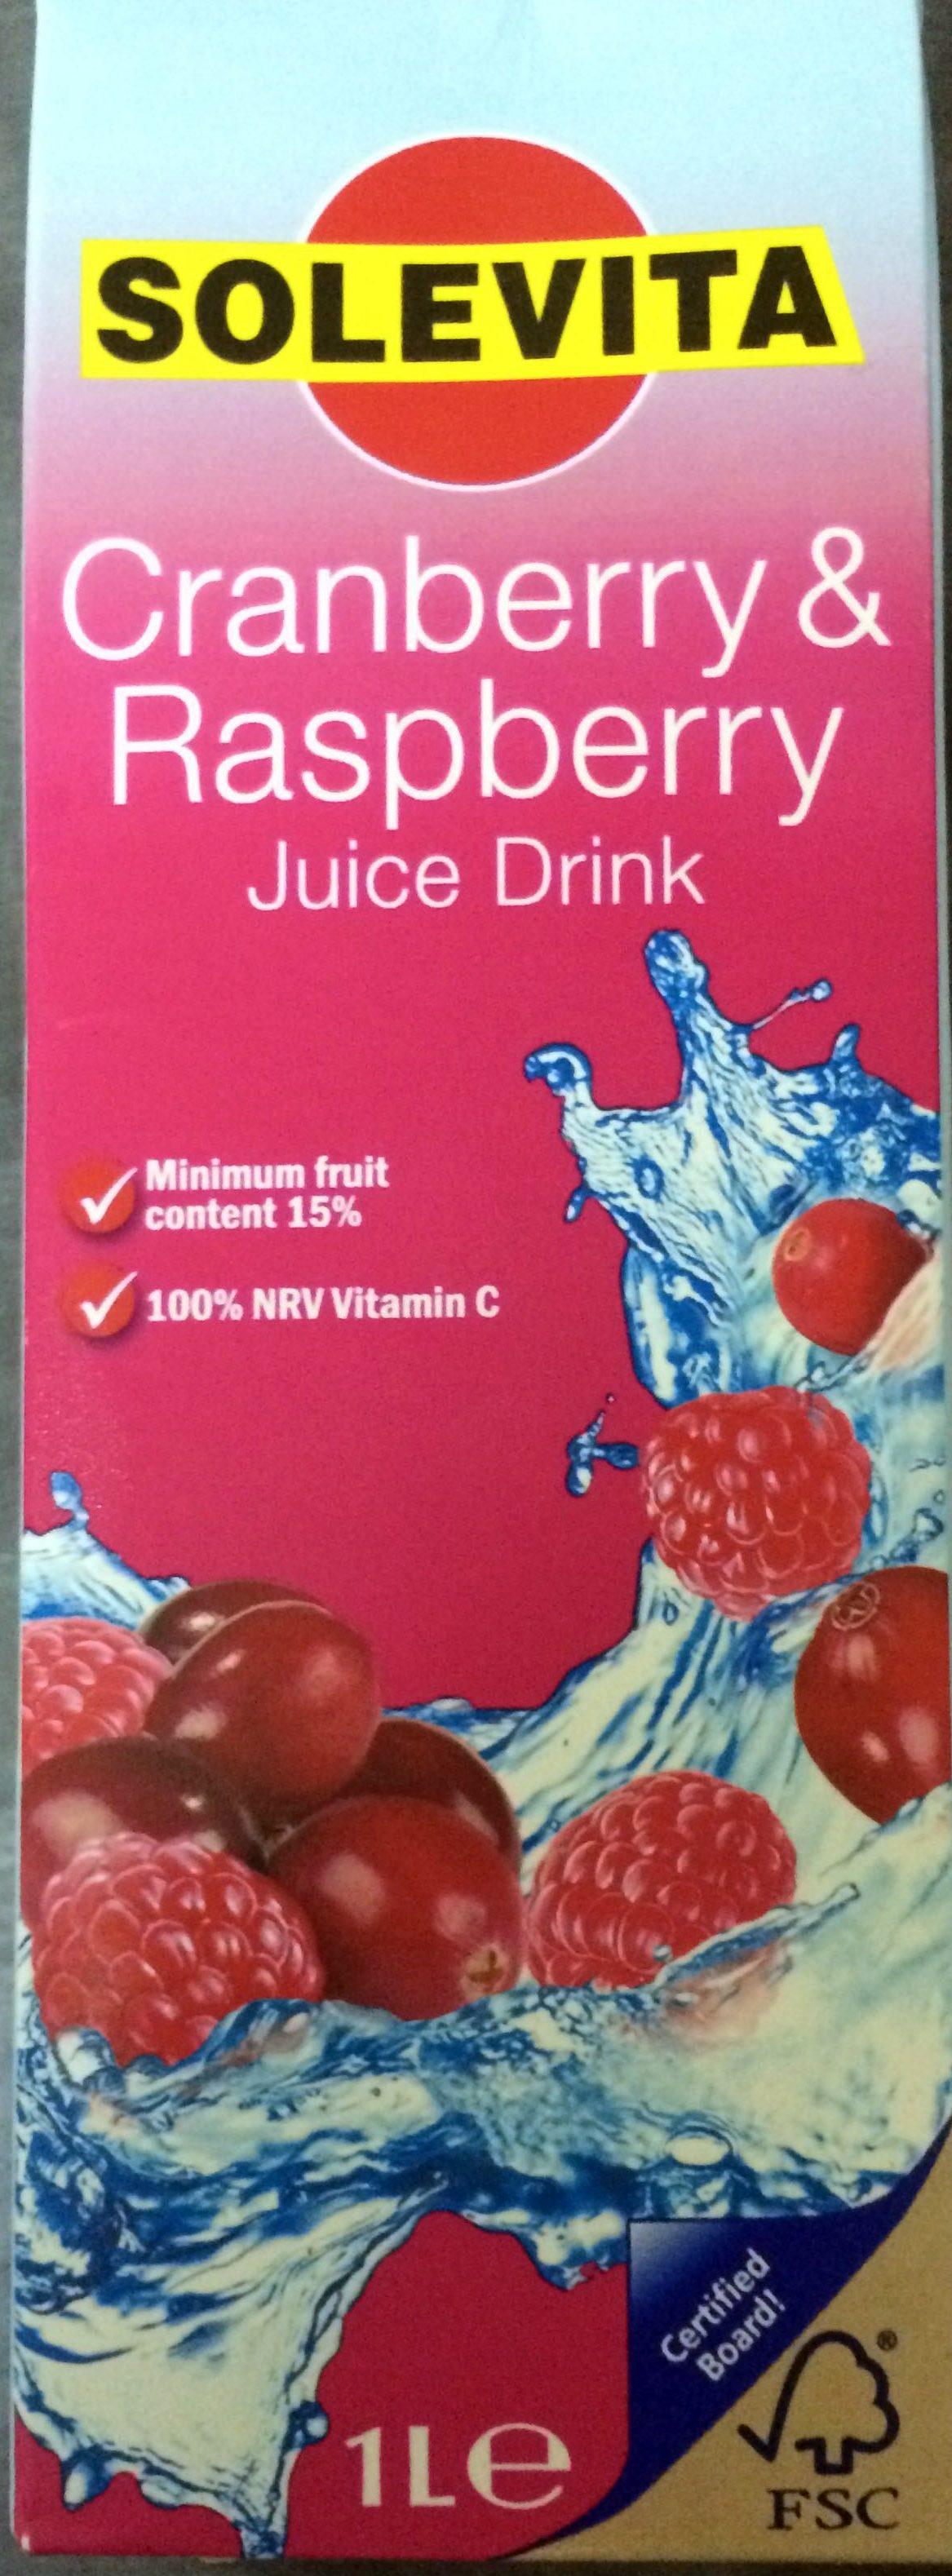 Cranberry & raspberry juice drink - Product - en